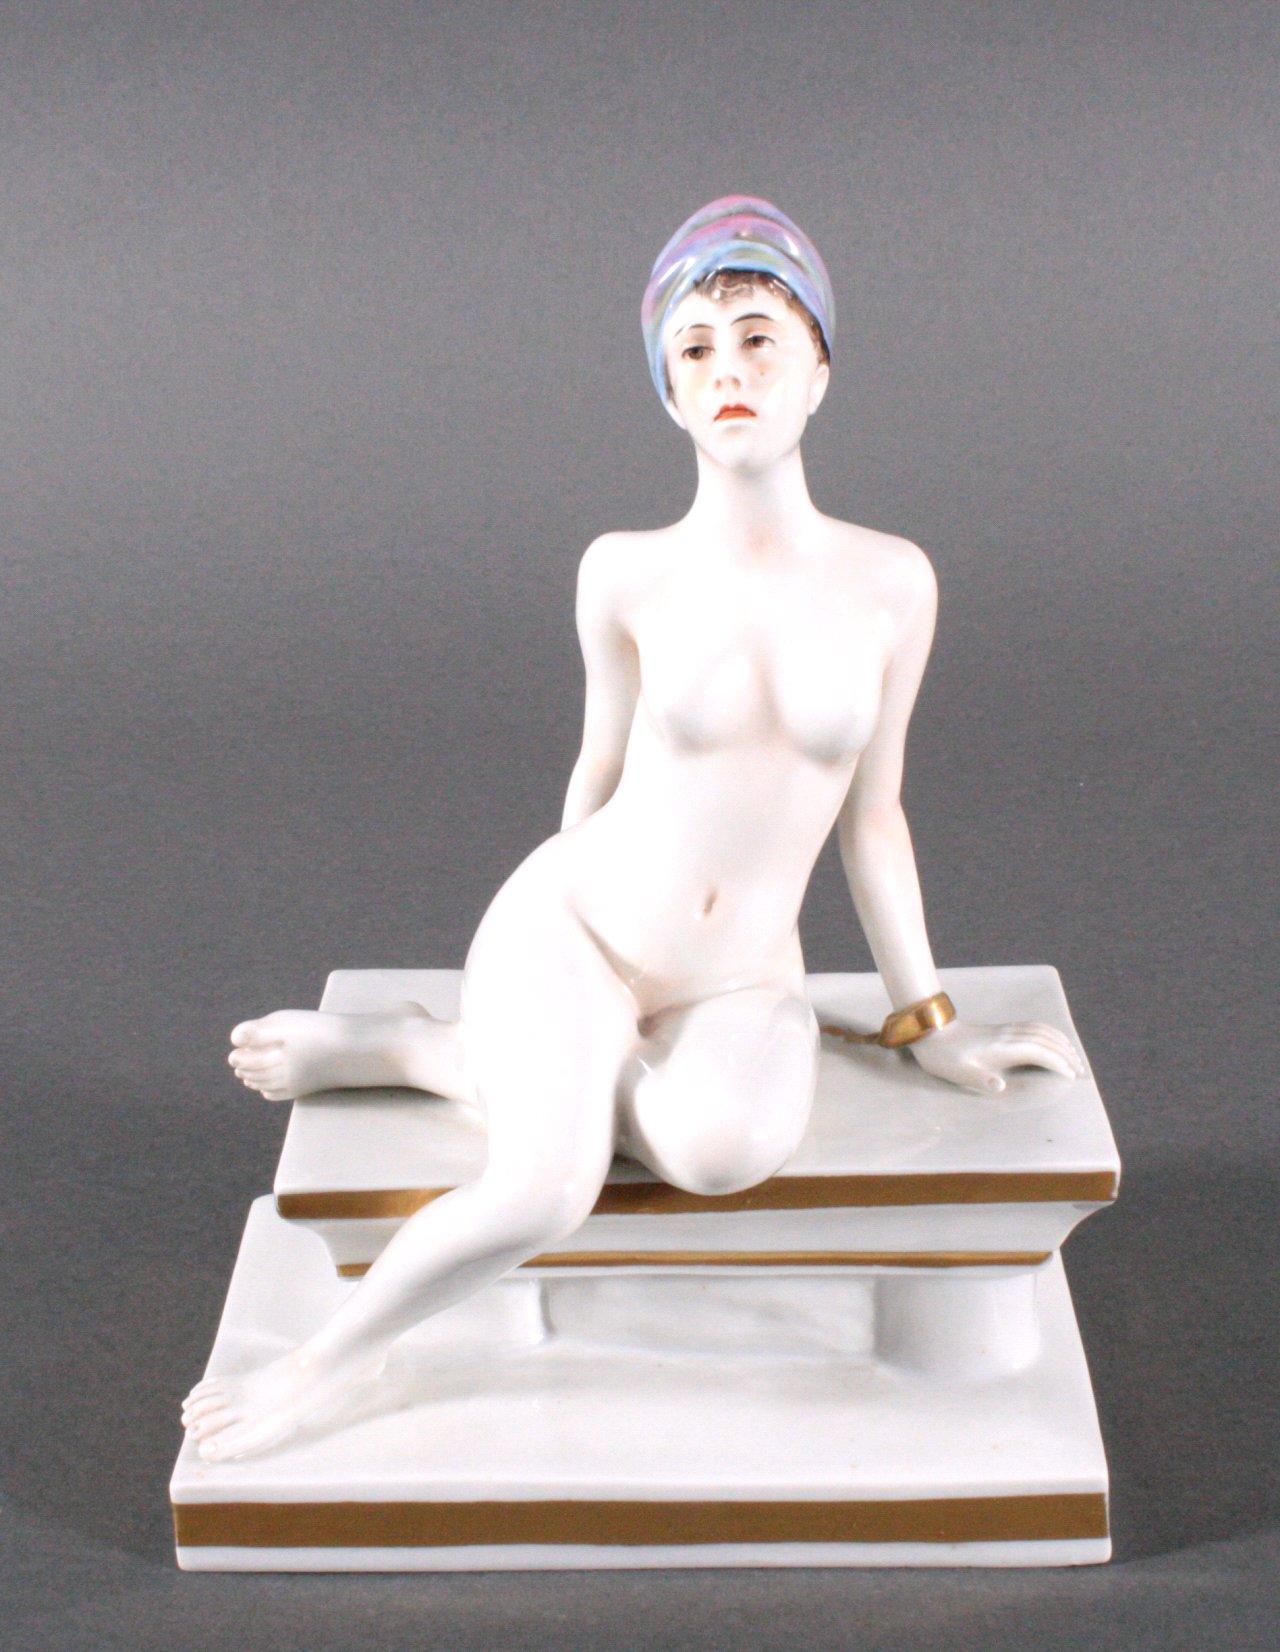 Porzellan-Skulptur, Aelteste Vokstedter.